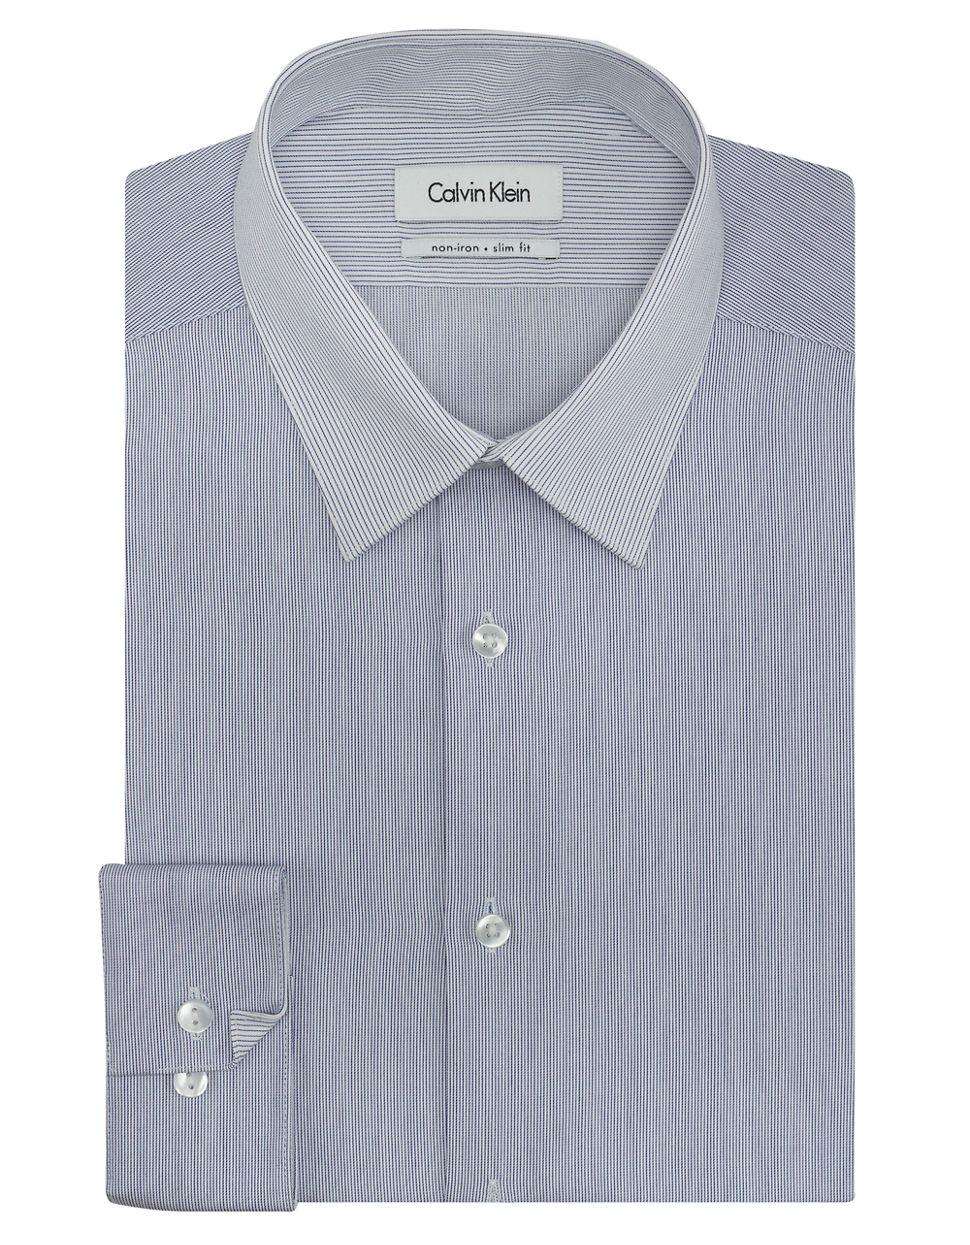 Calvin Klein Pinstripe Non Iron Slim Fit Dress Shirt In